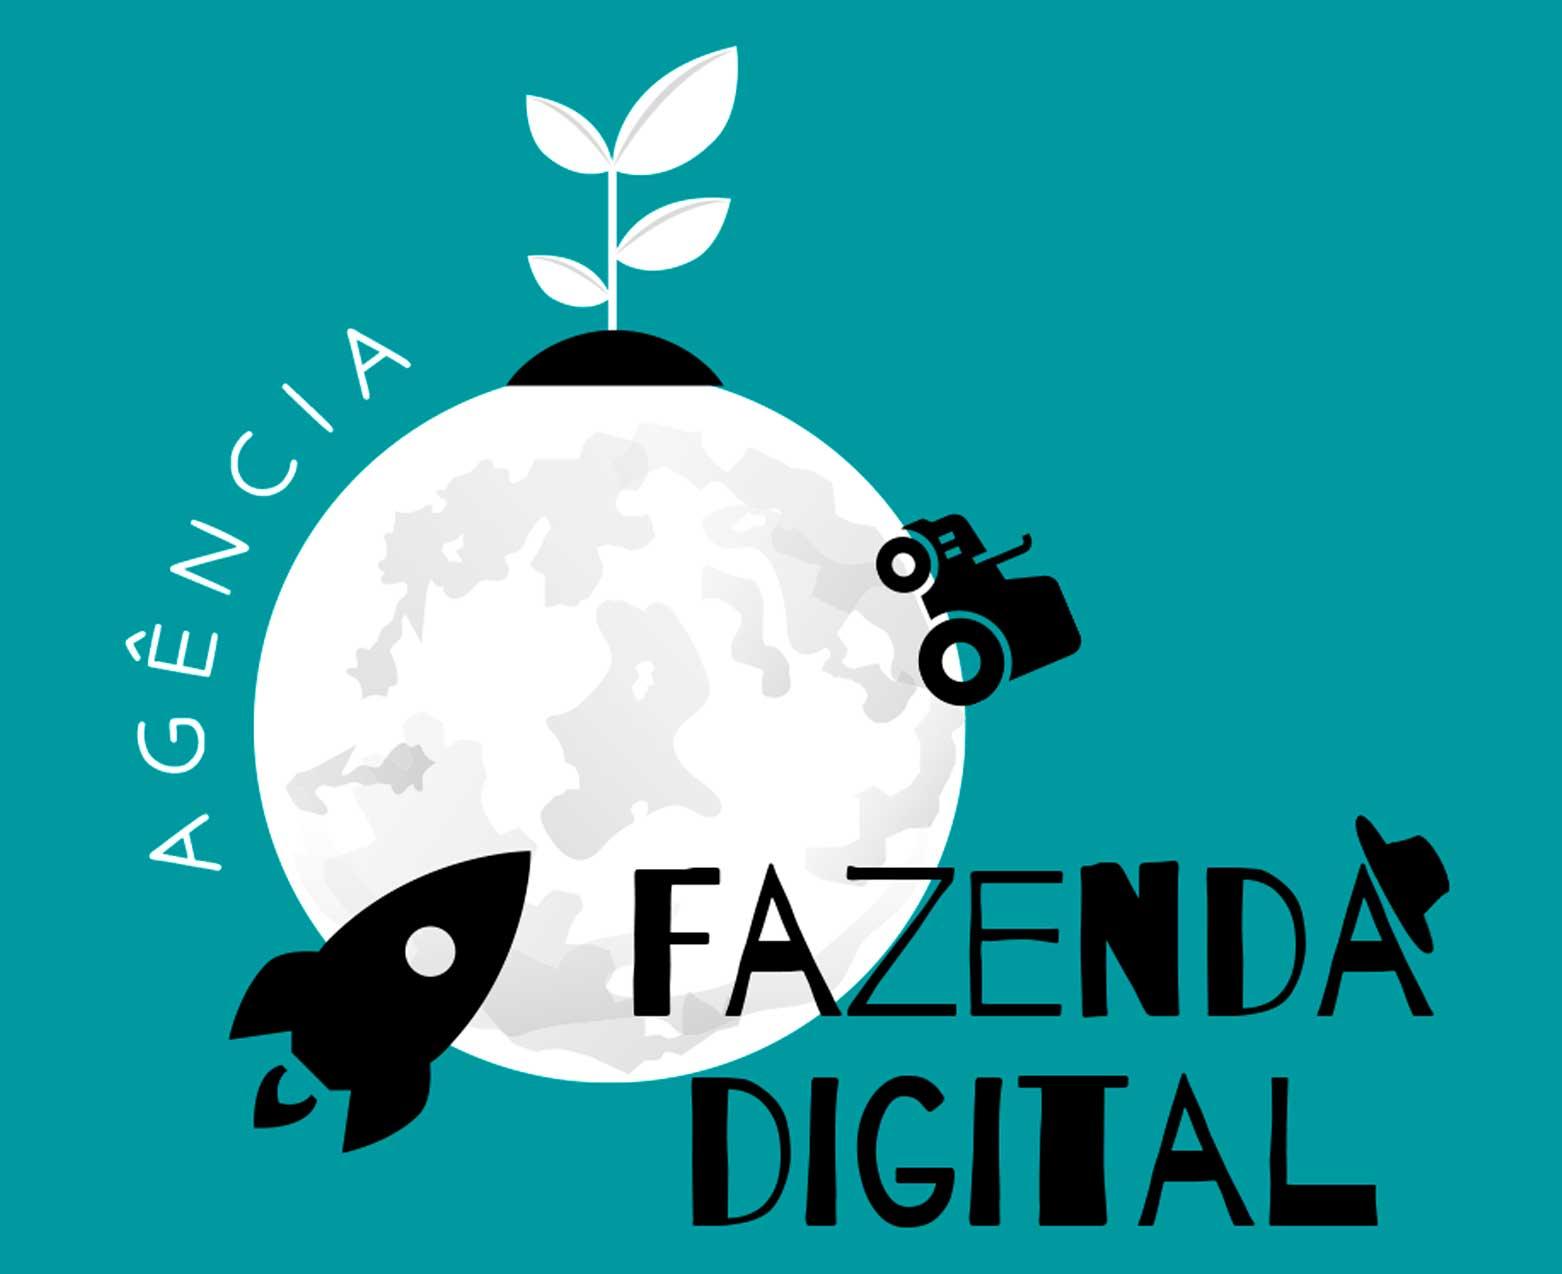 Agência Fazenda Digital